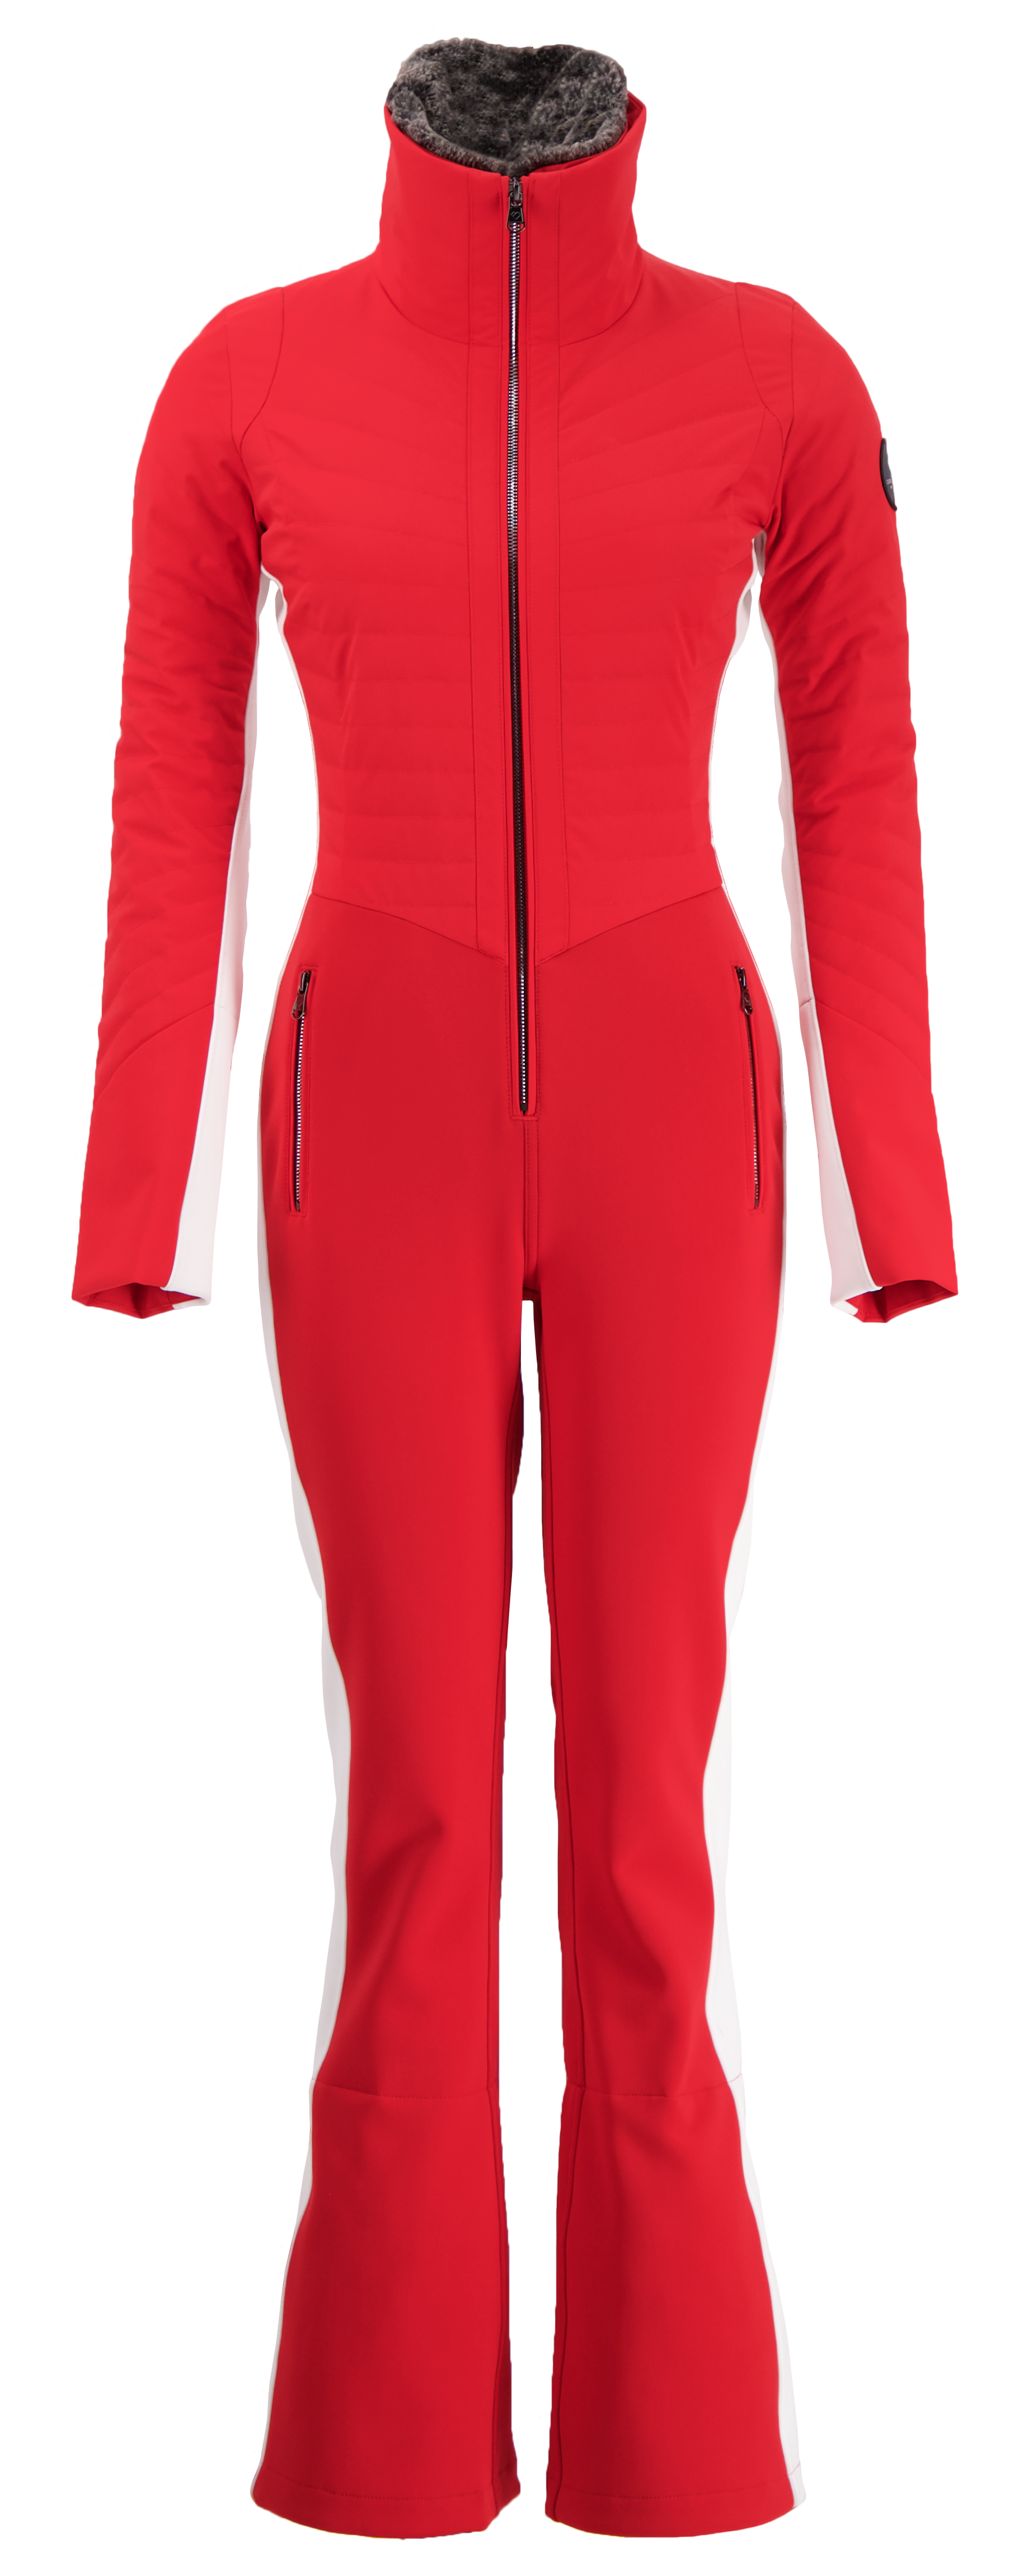 The 2021 Salomon Stance W 88 Women's Frontside Ski thumb